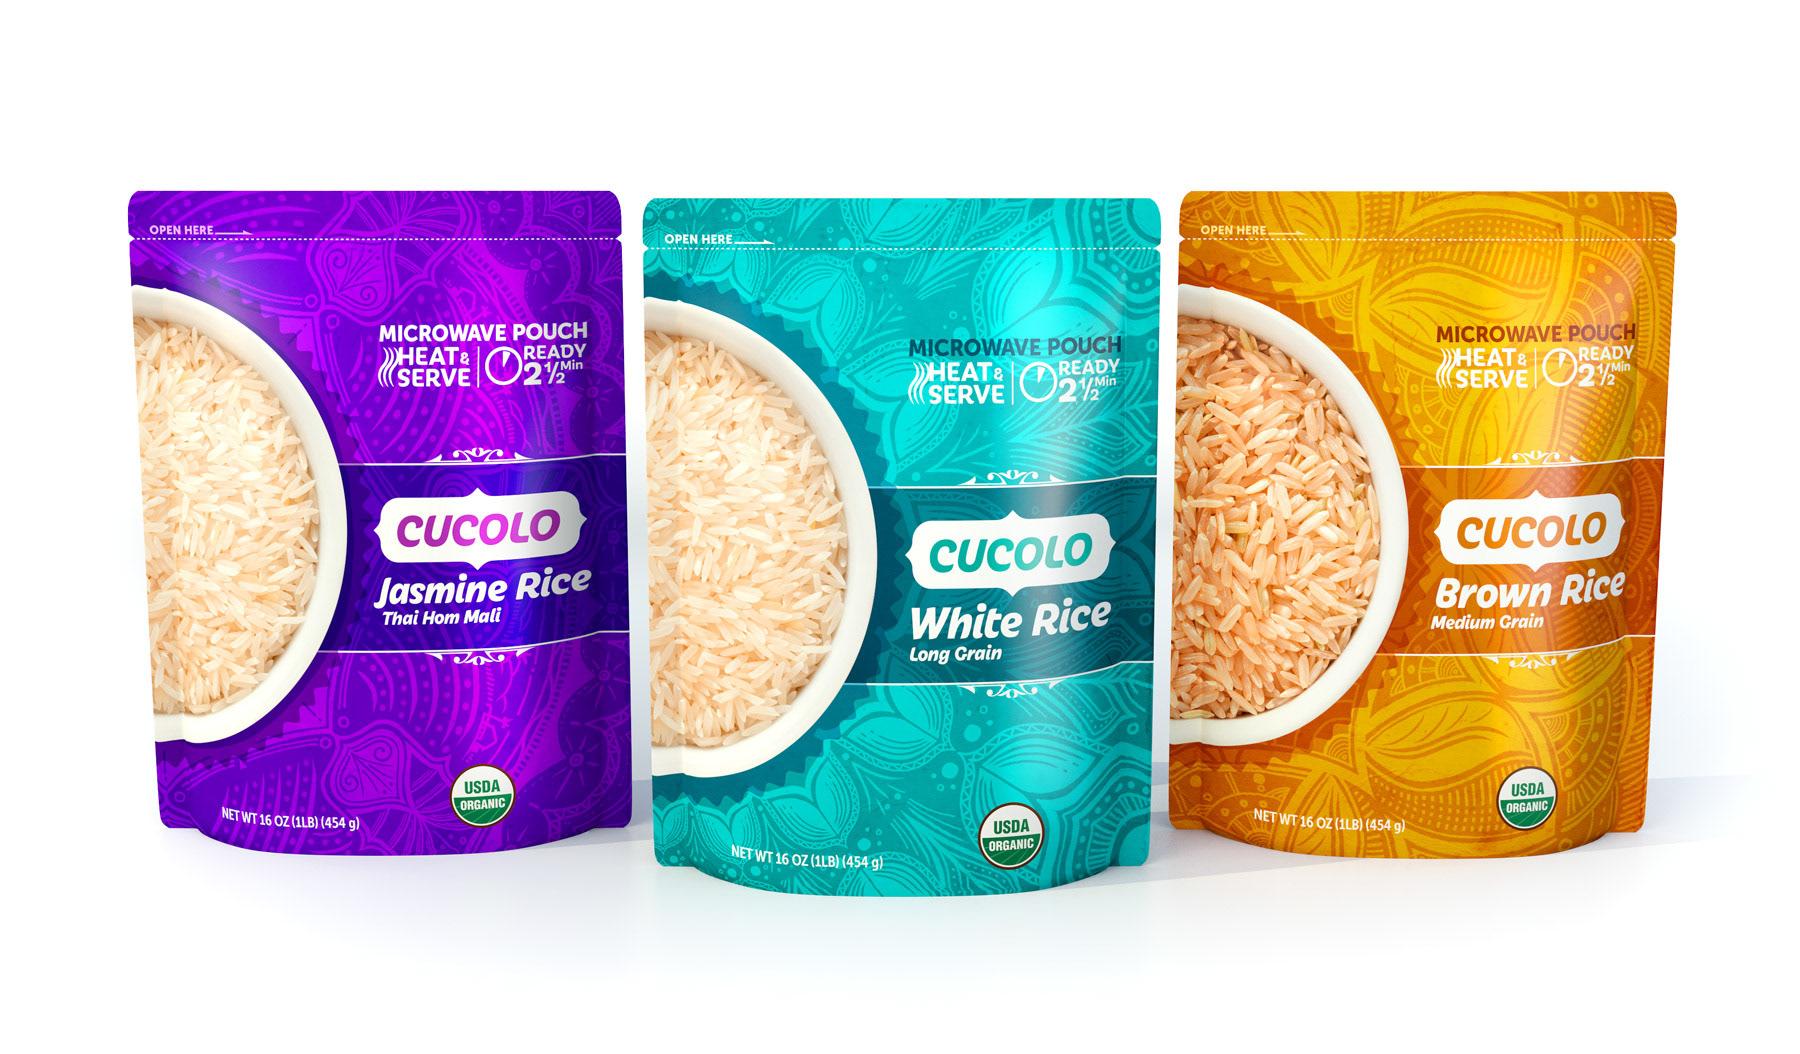 Anton Weaver Cucolo Rice Package Design And Branding Сколько стоит билет, есть ли льготы или. anton weaver cucolo rice package